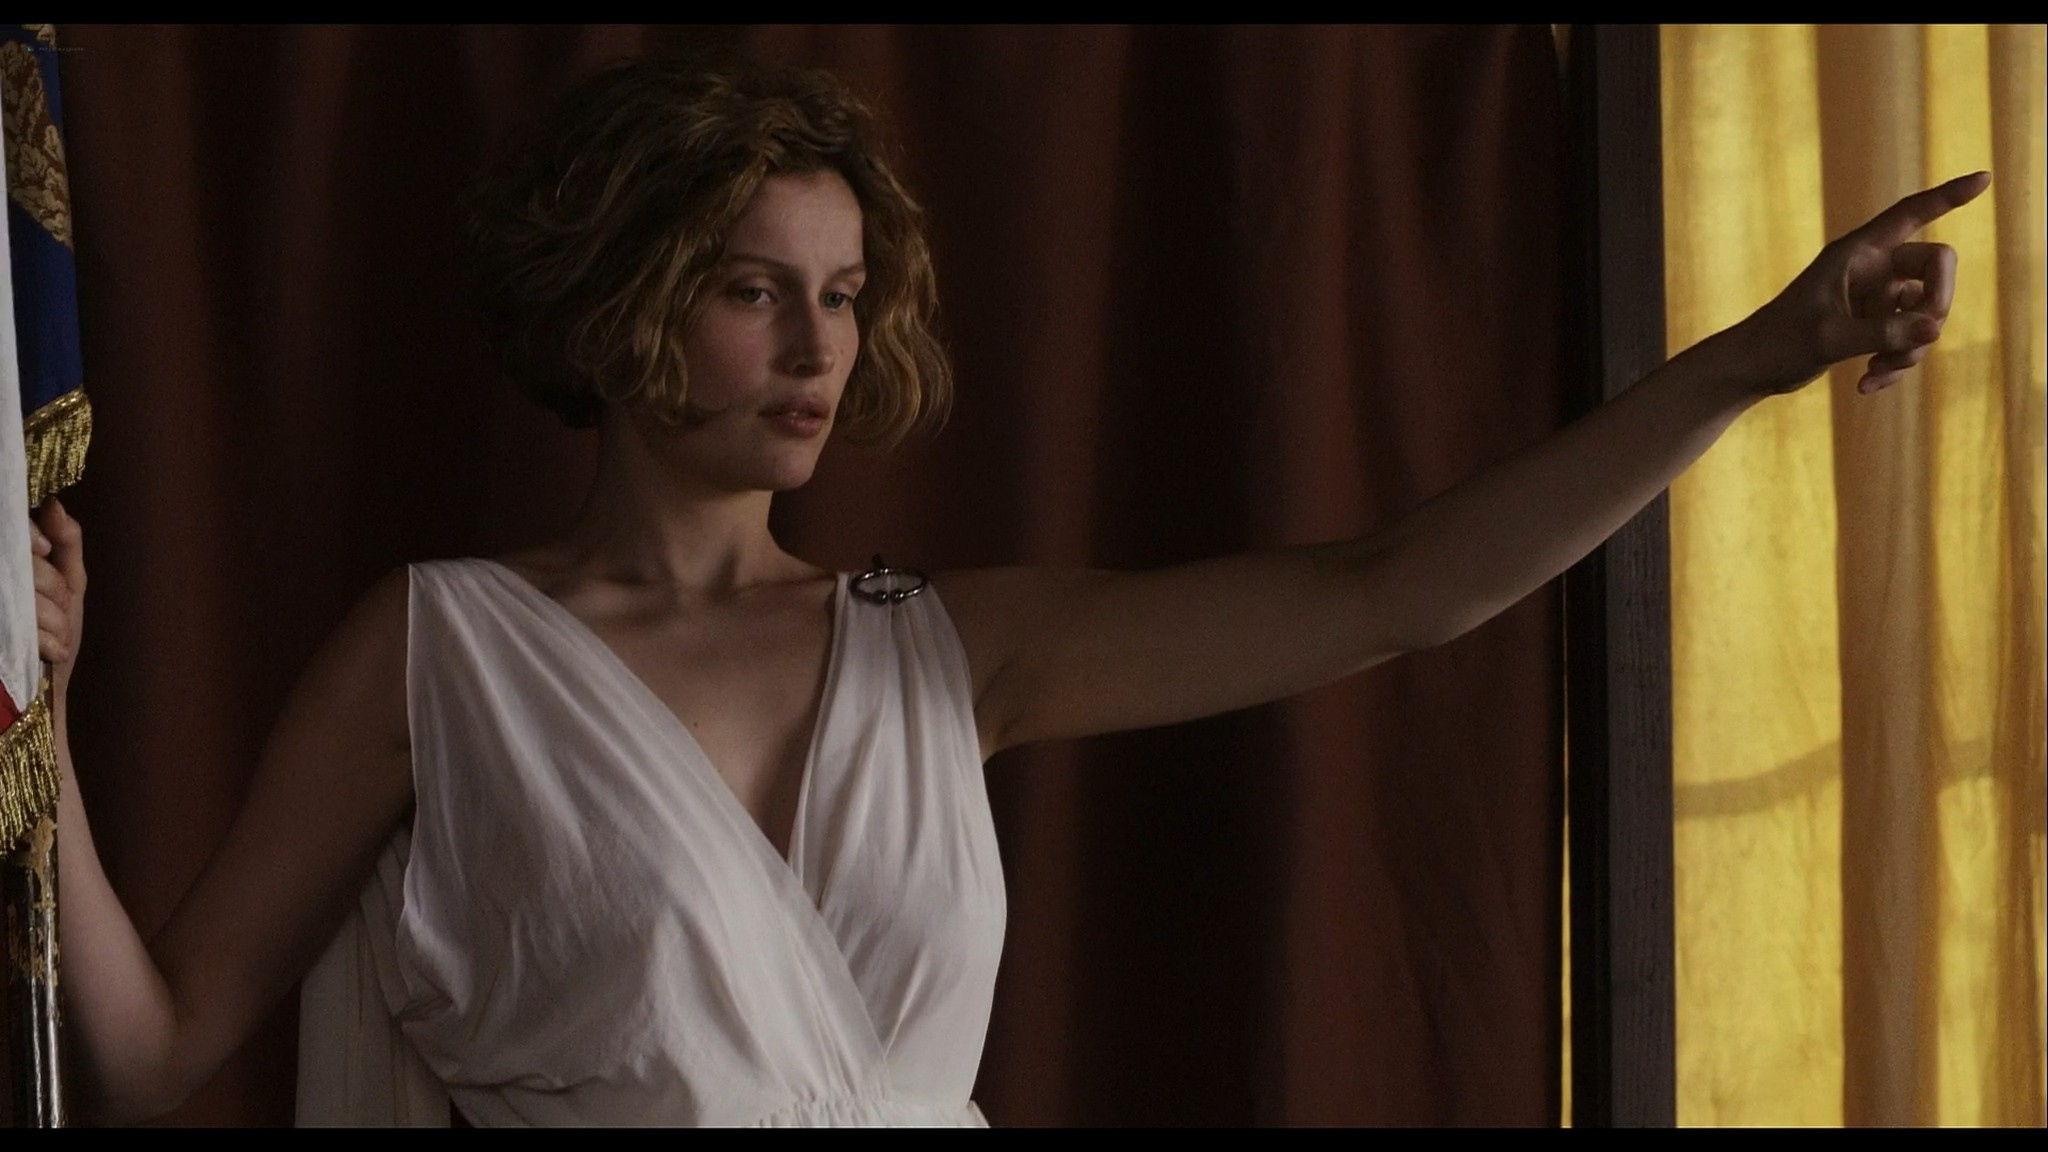 Laetitia Casta nude topless and very hot La jeune fille et les loups 2007 HD 1080p BluRay 3